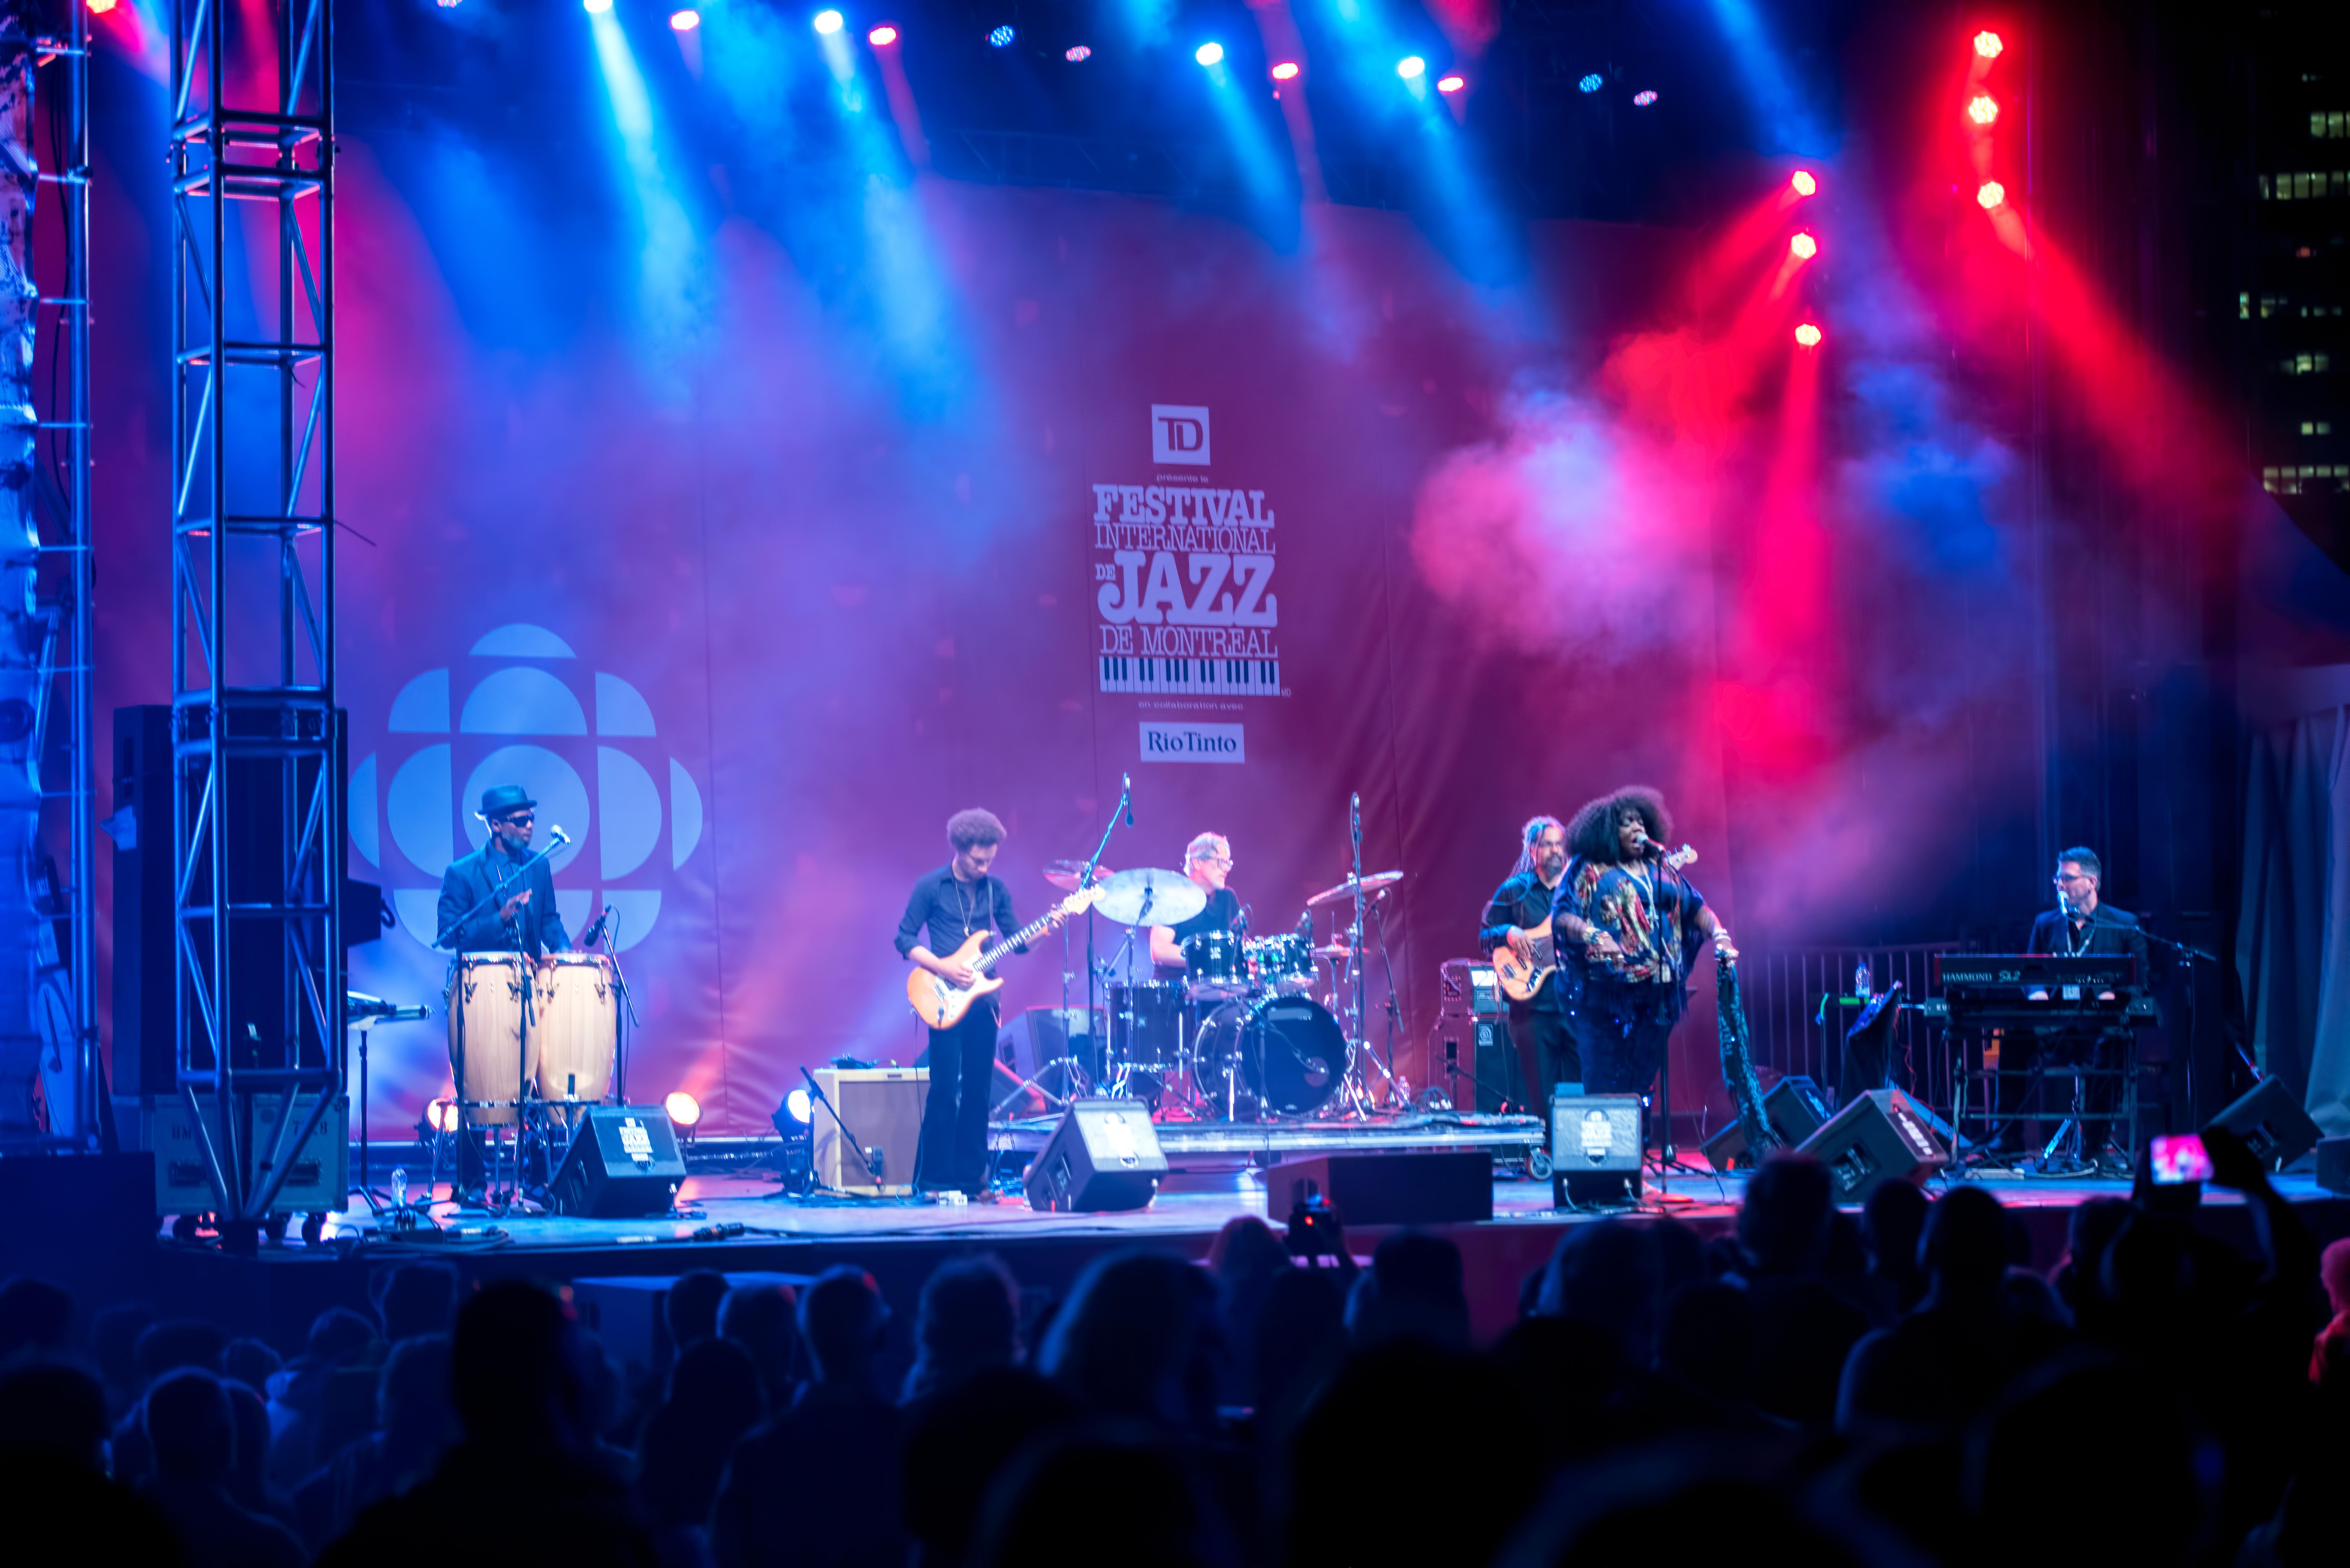 Thornetta Davis Band At The Montreal International Jazz Festival 2018